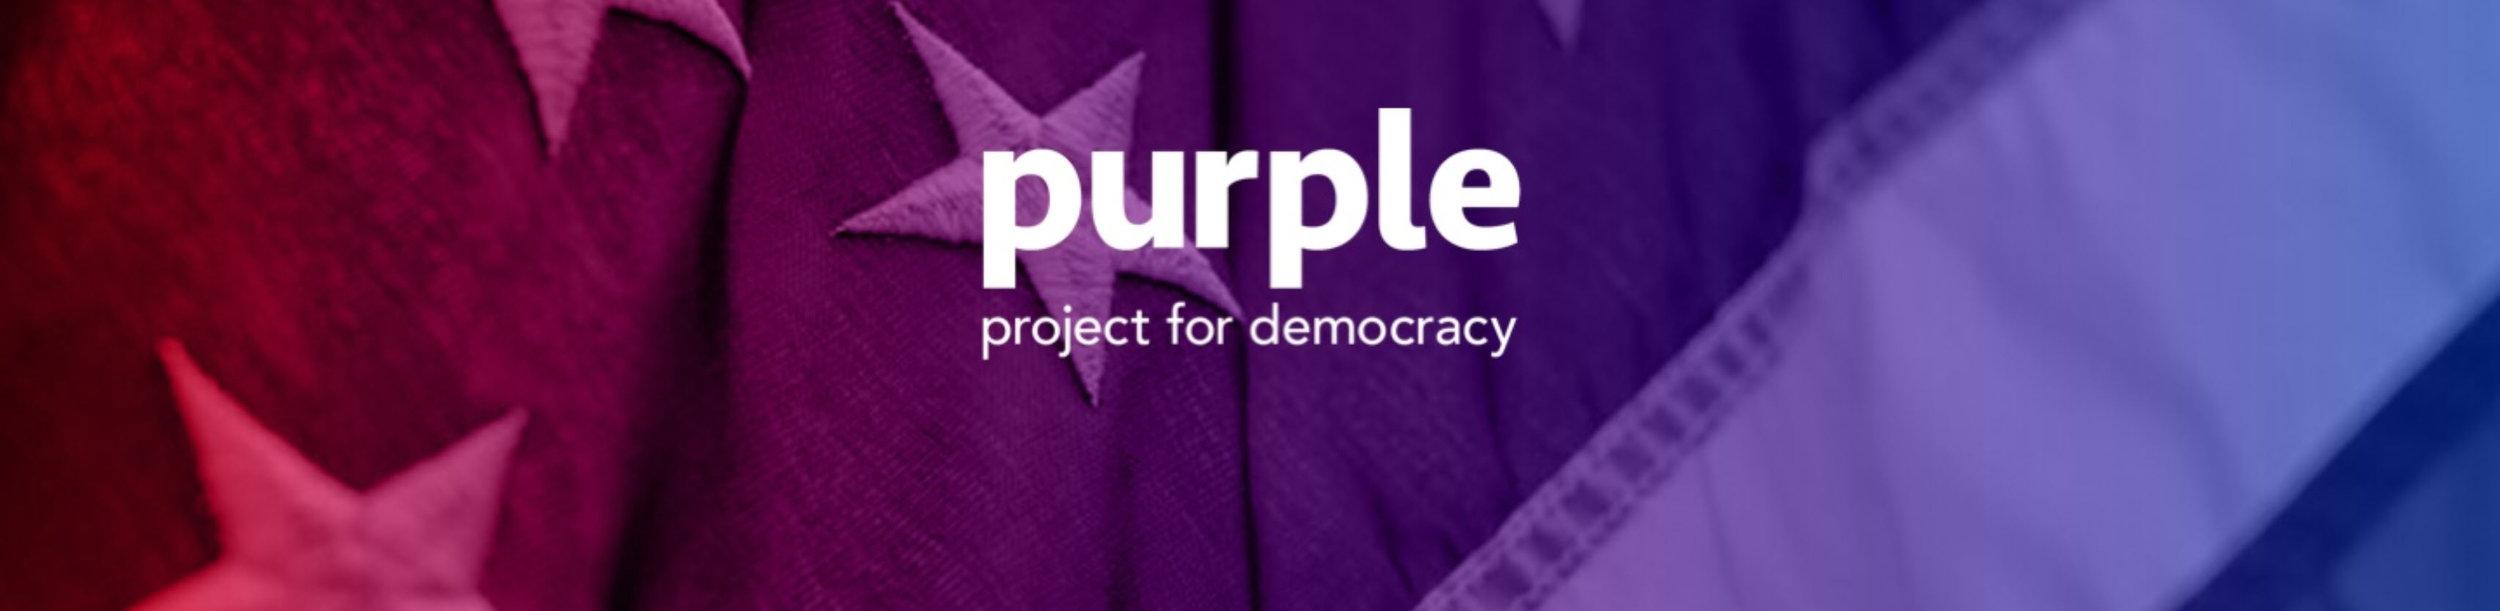 purpleBannerWide.jpg